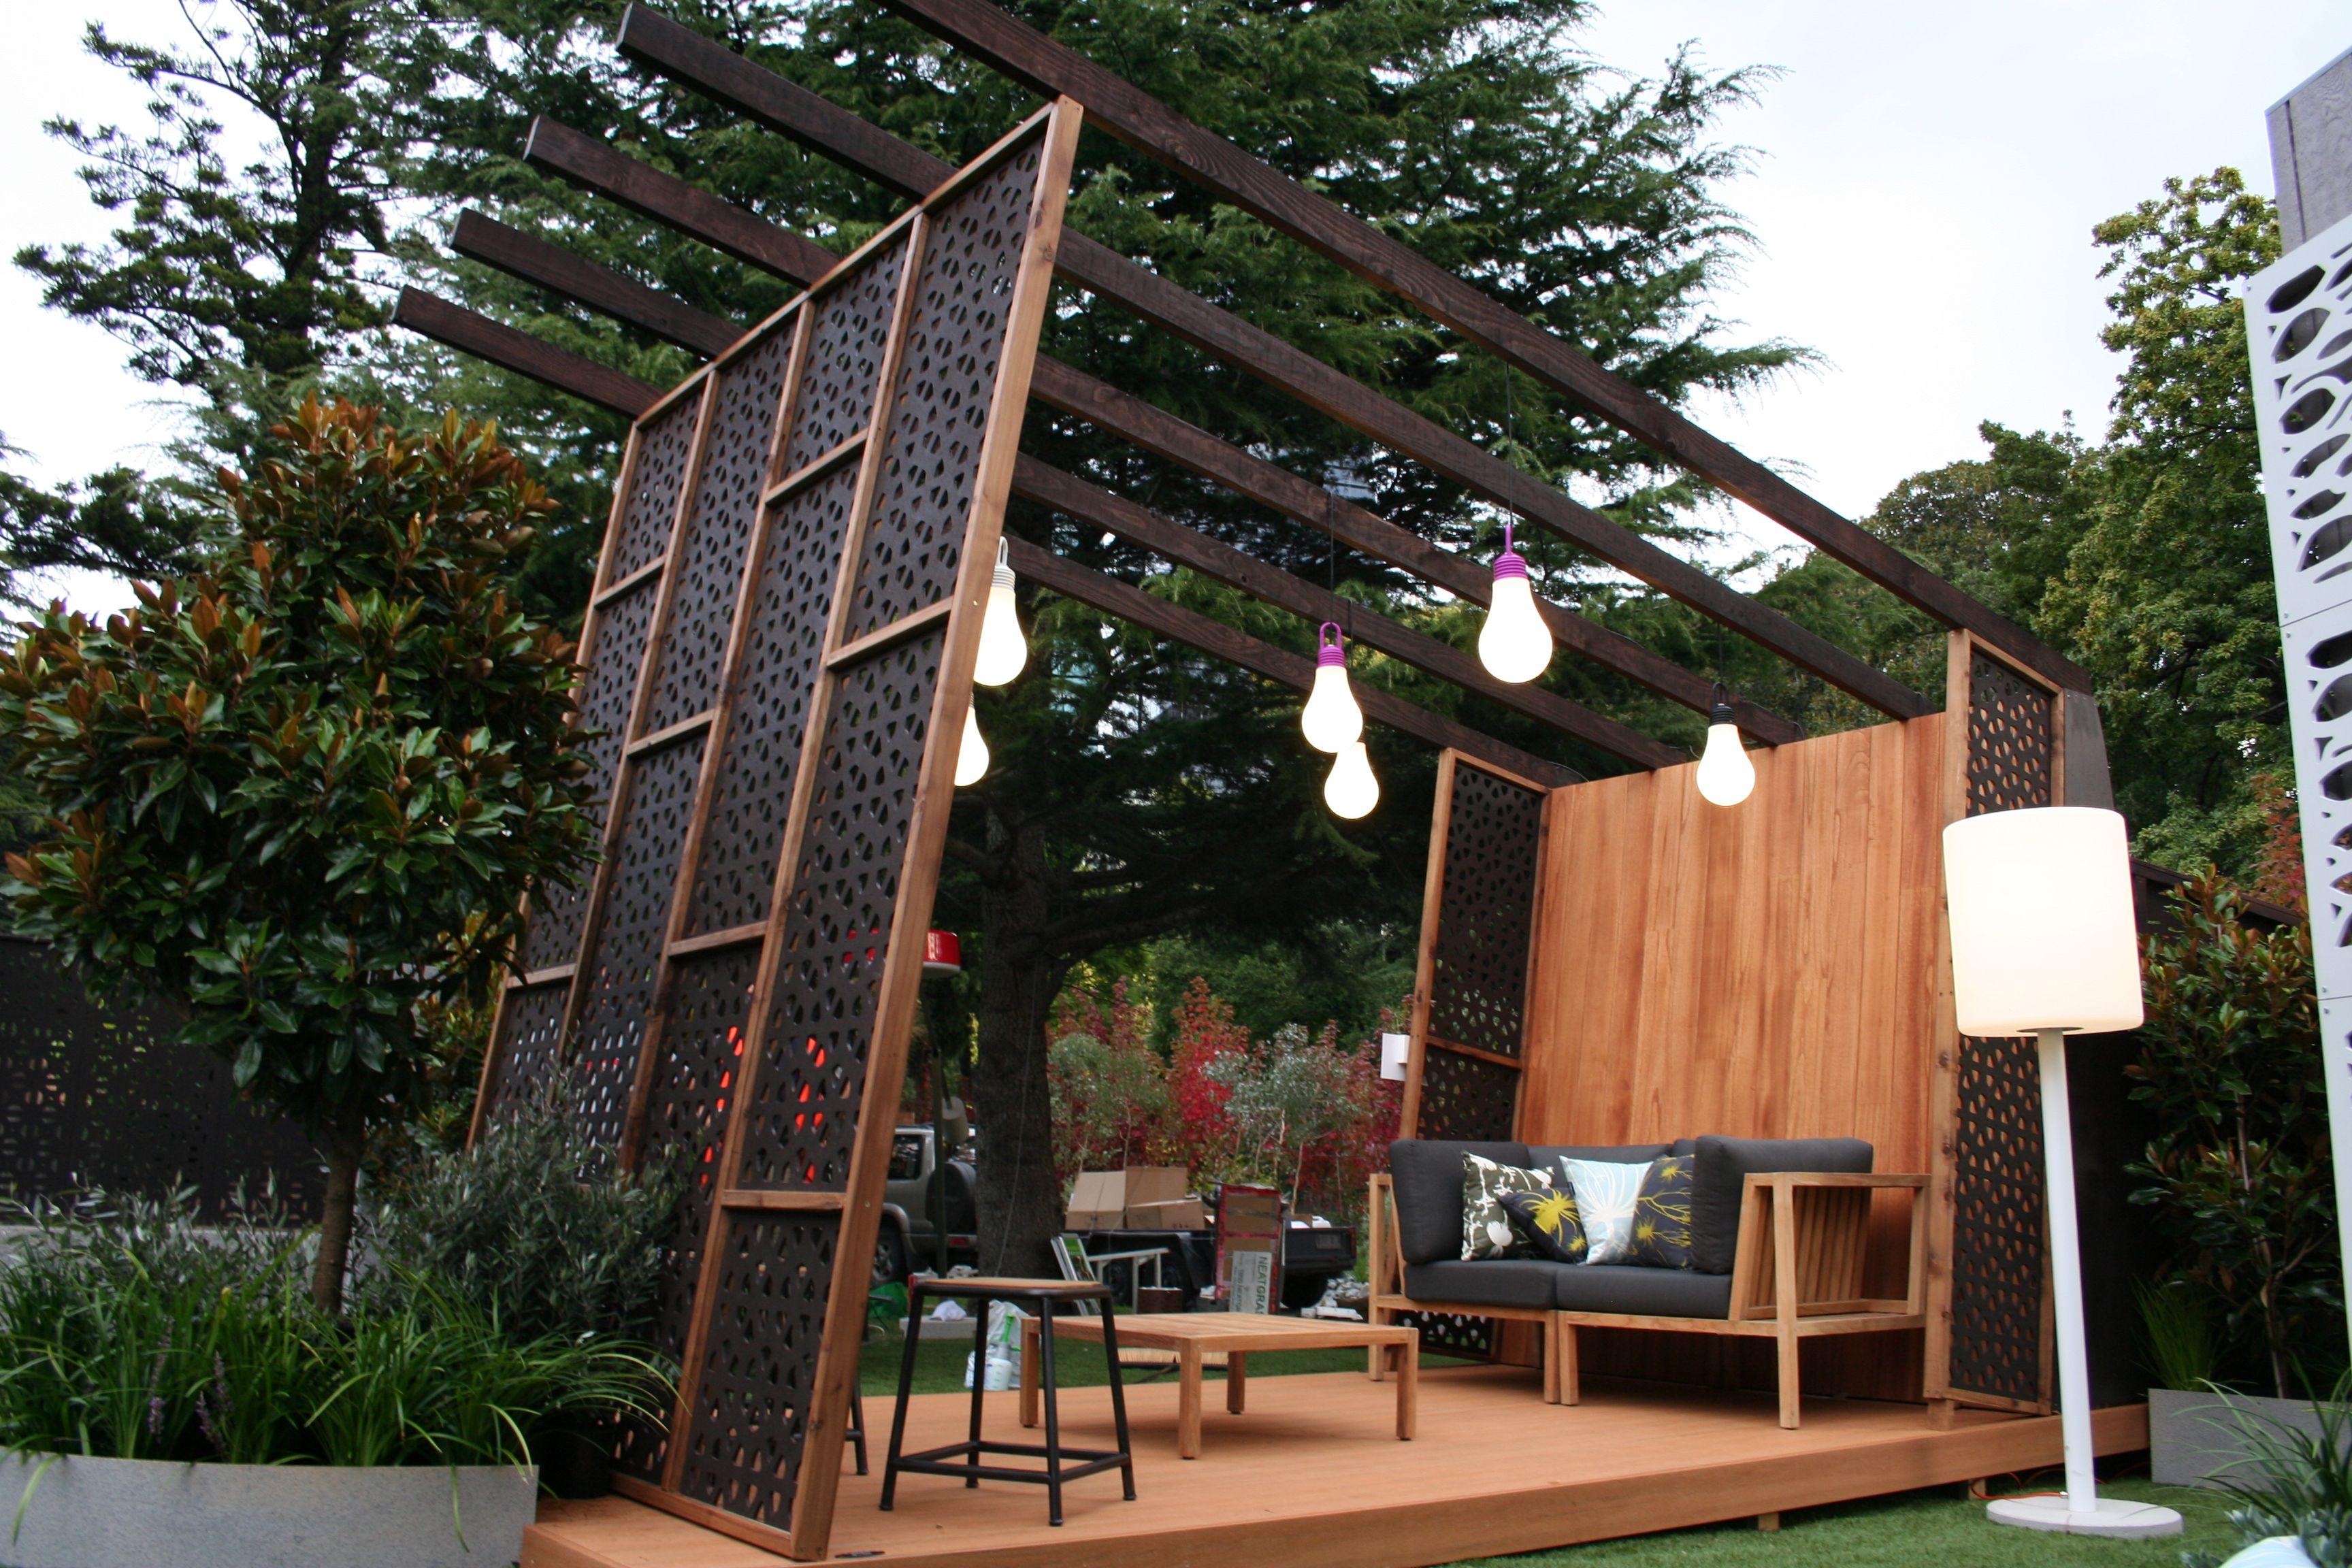 Custom Stylish Metal Laser Cut Panels As Outdoor Decorative Garden